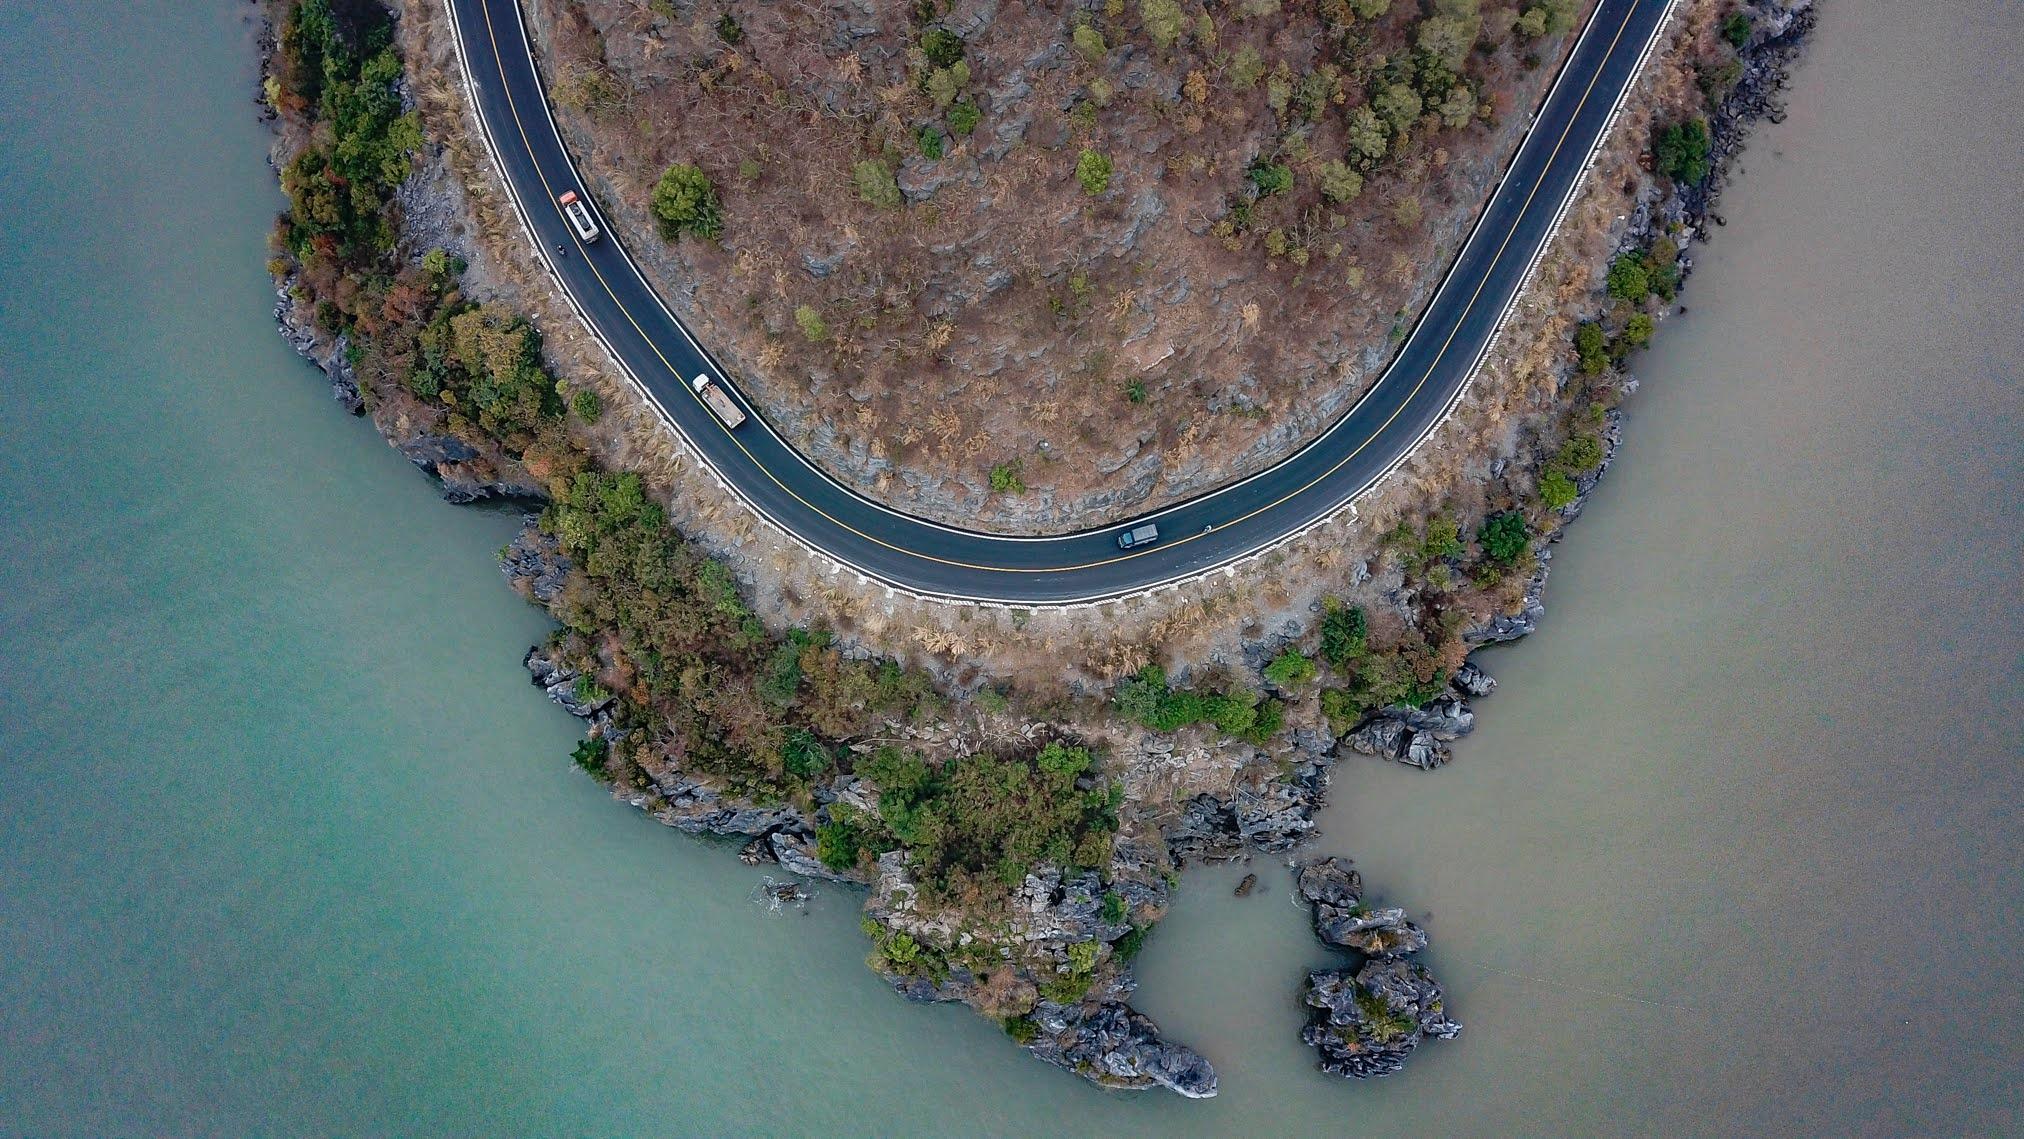 Experience one of Vietnam's most stunning coastal roads